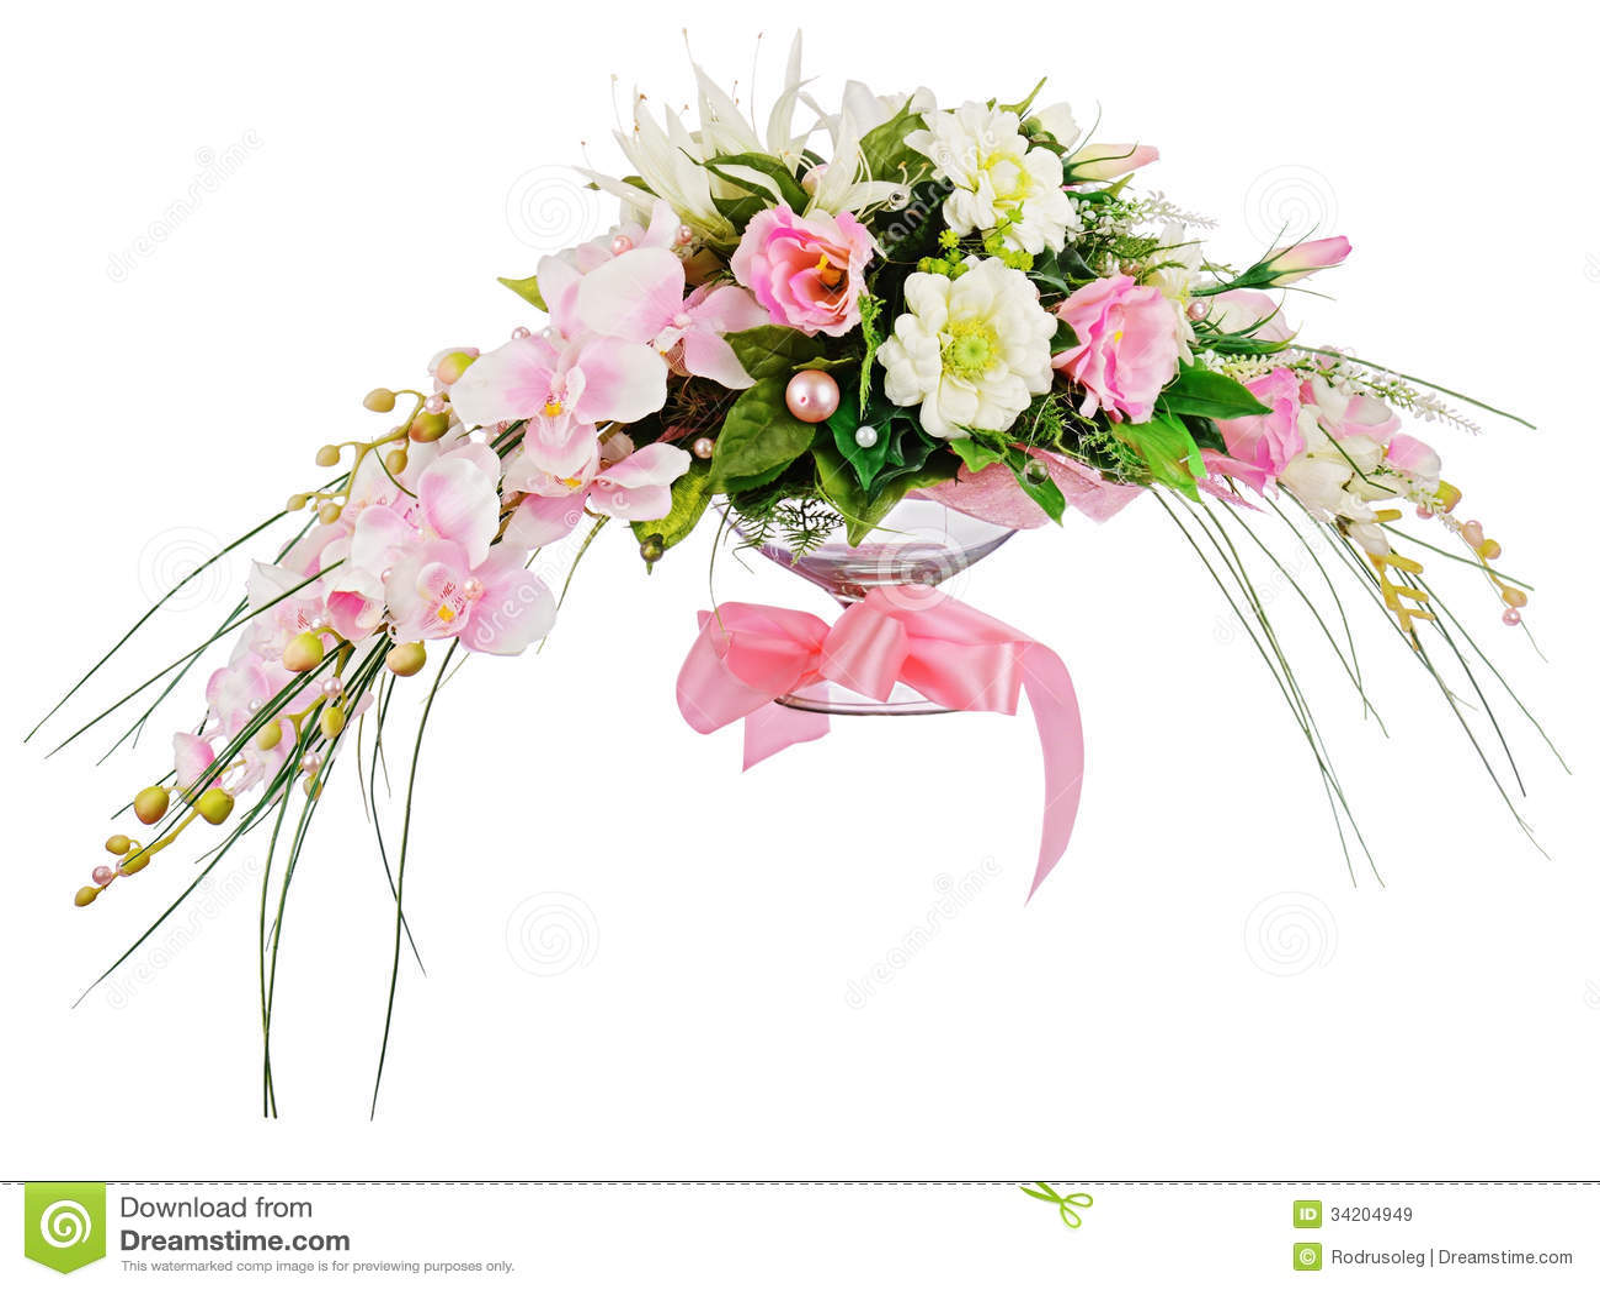 Floral Bouquet Of Roses And Orchids Arrangement